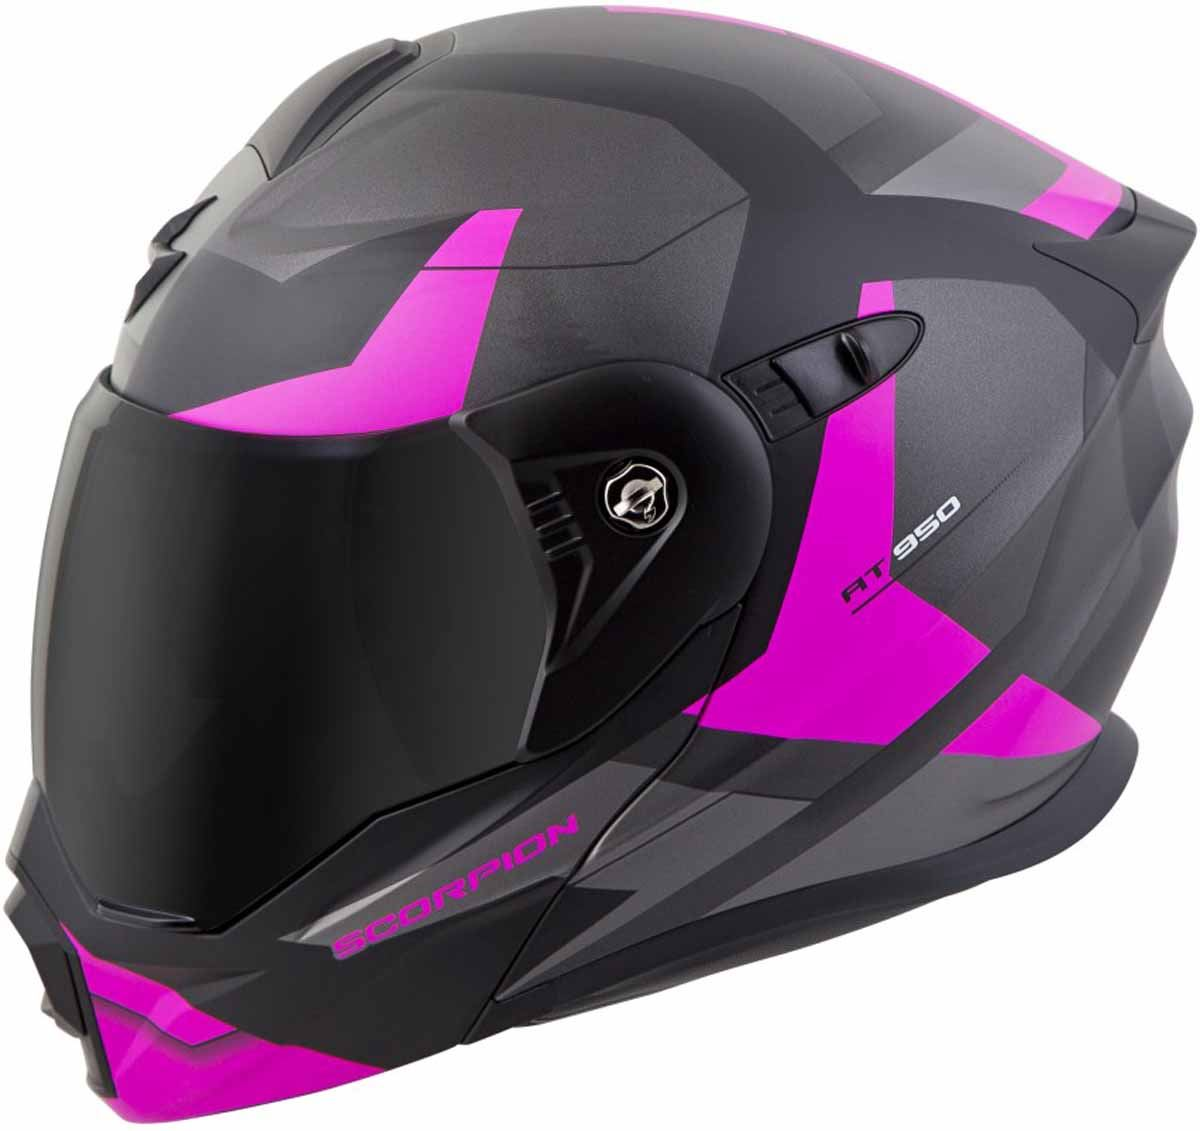 Scorpion-EXO-AT950-Helmet-Flip-Up-Modular-Dual-Sport-Adventure-ADV-DOT-XS-3XL miniature 44